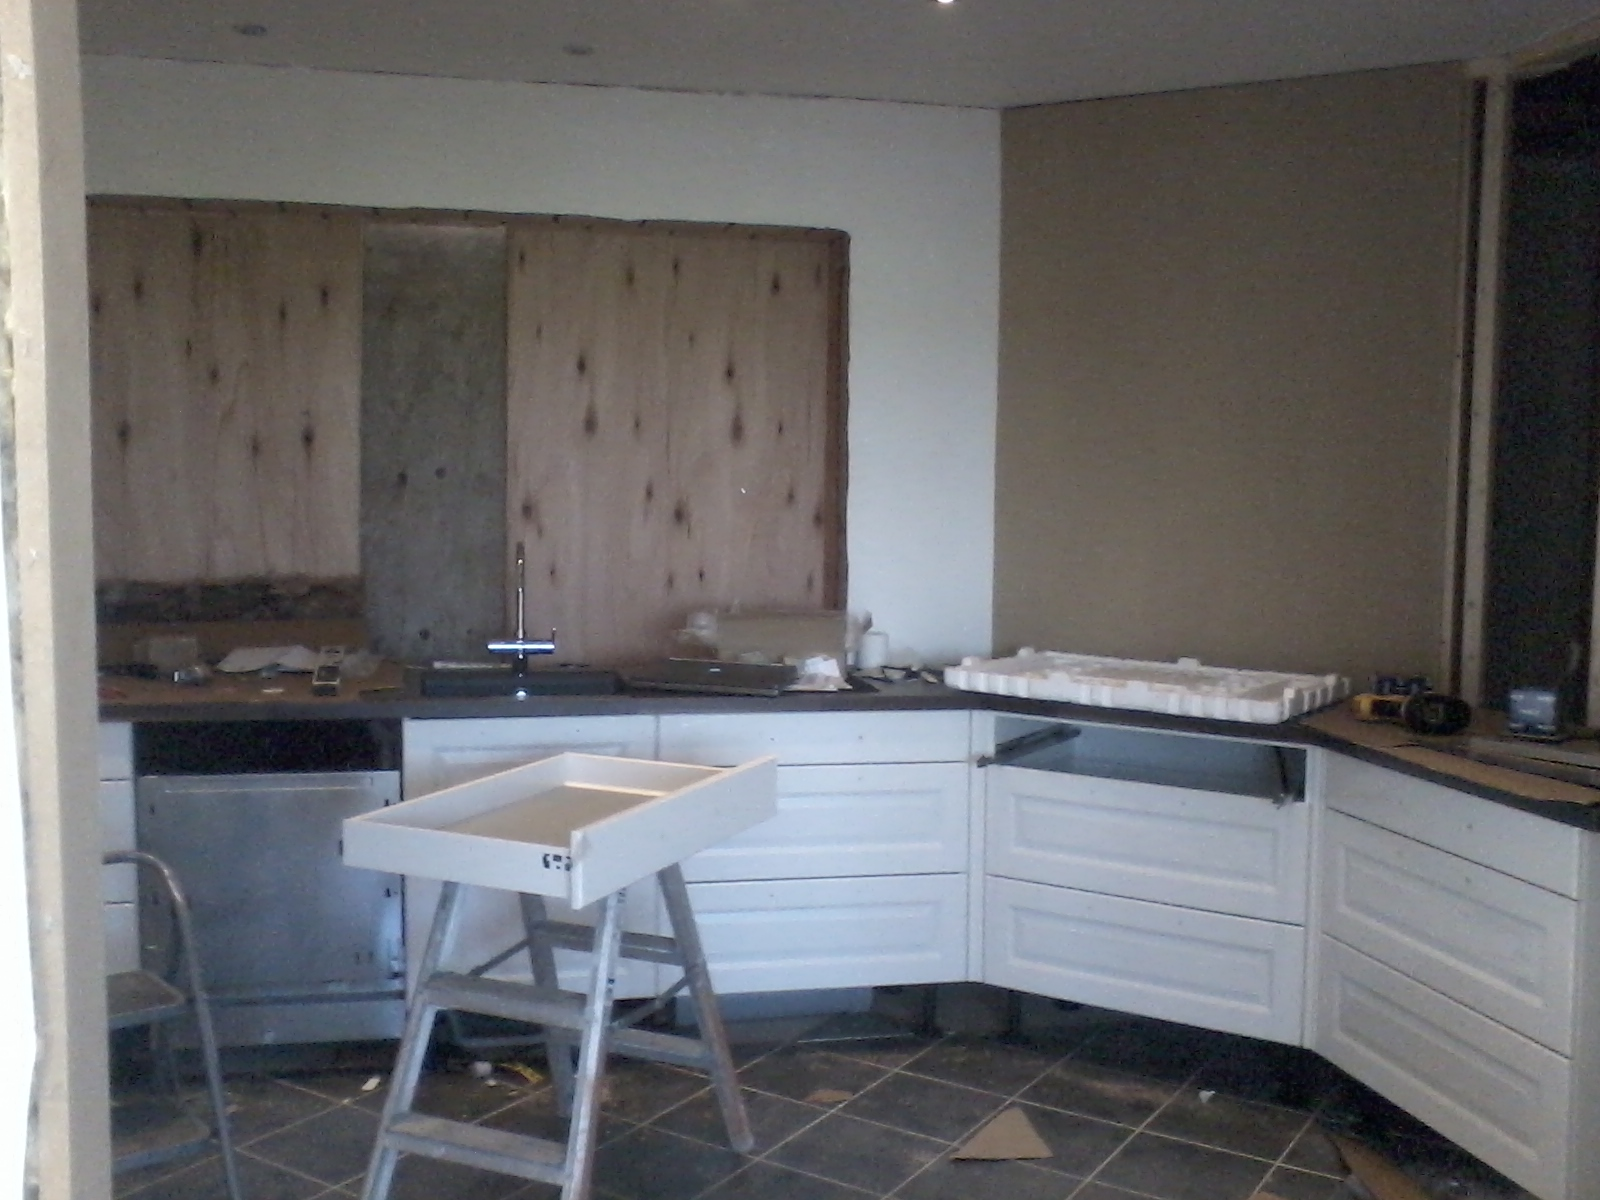 Byggeproject: køkken